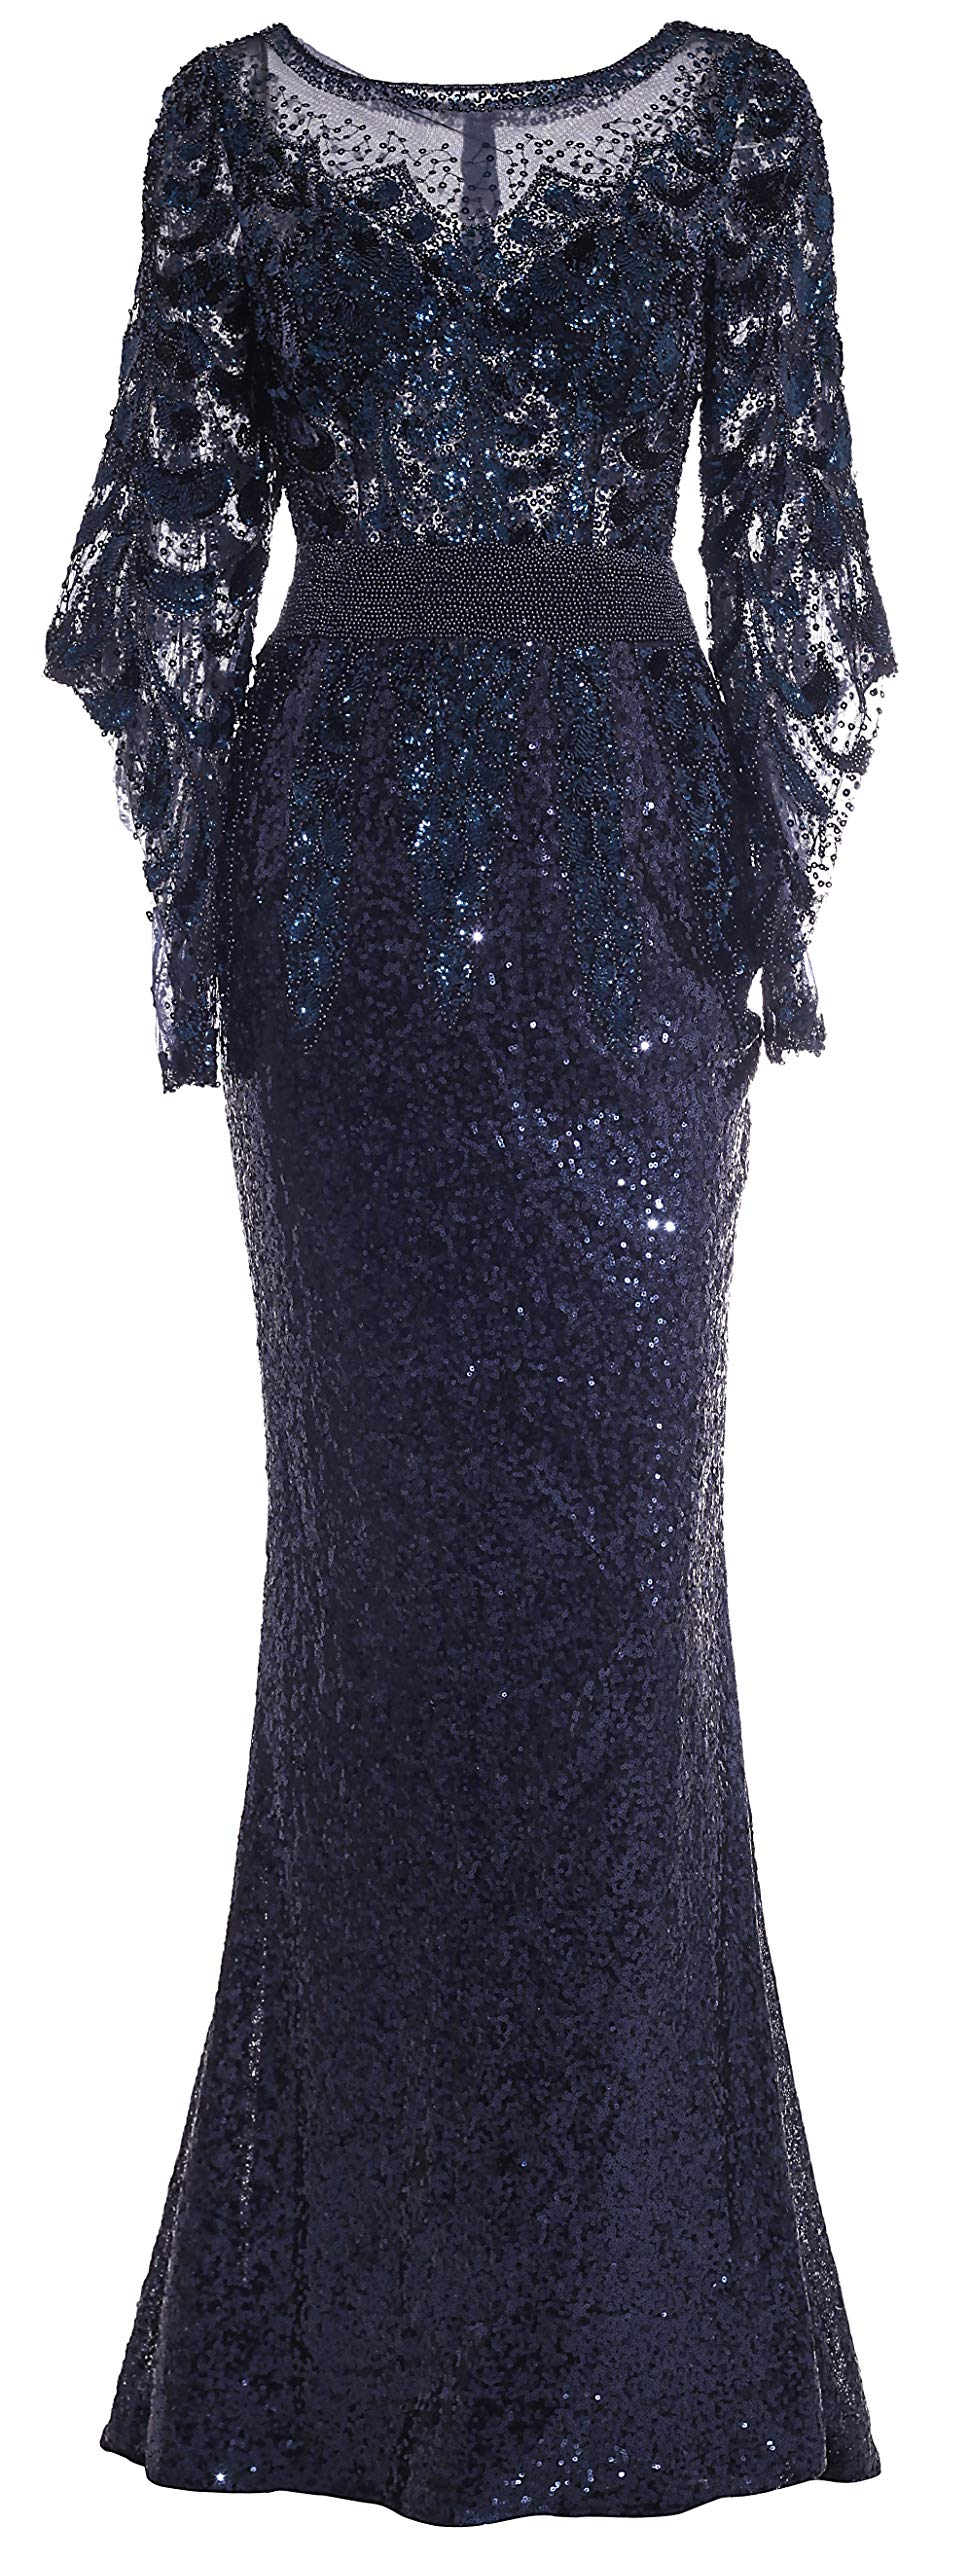 Meier Womens Sequin Formal Sleeves